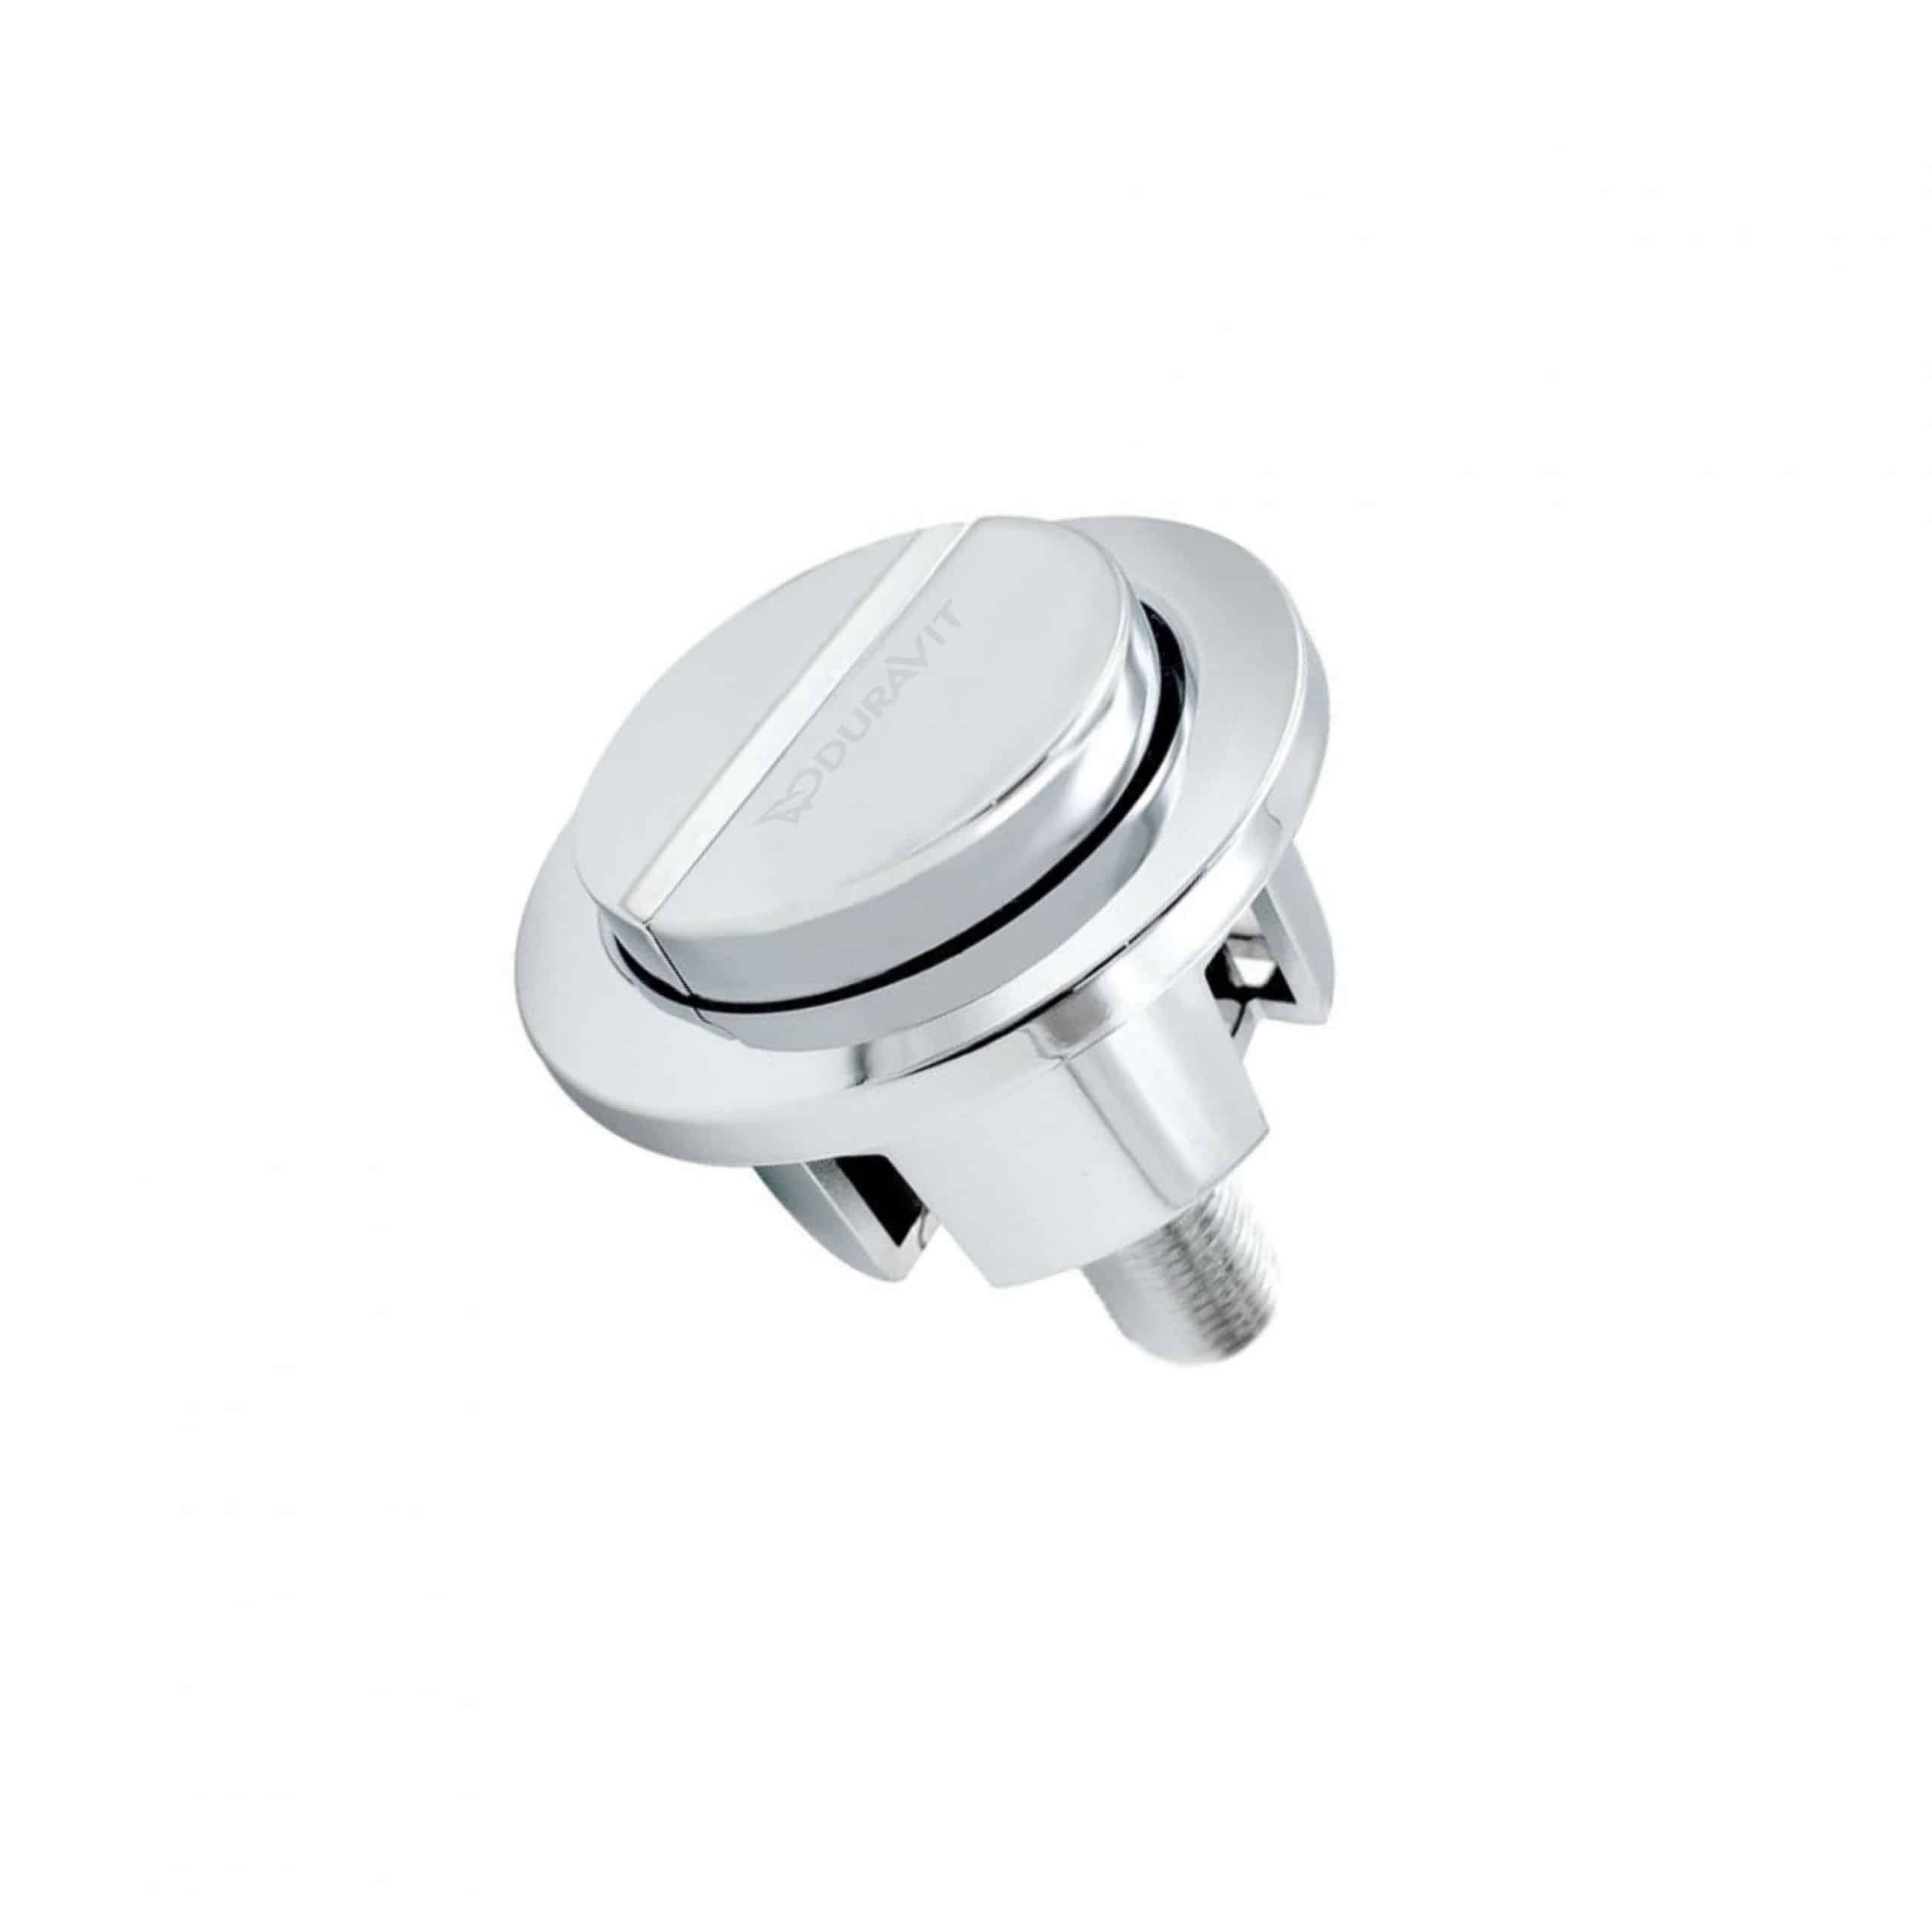 Duravit Type 290 Dual Flush Button 0074611000